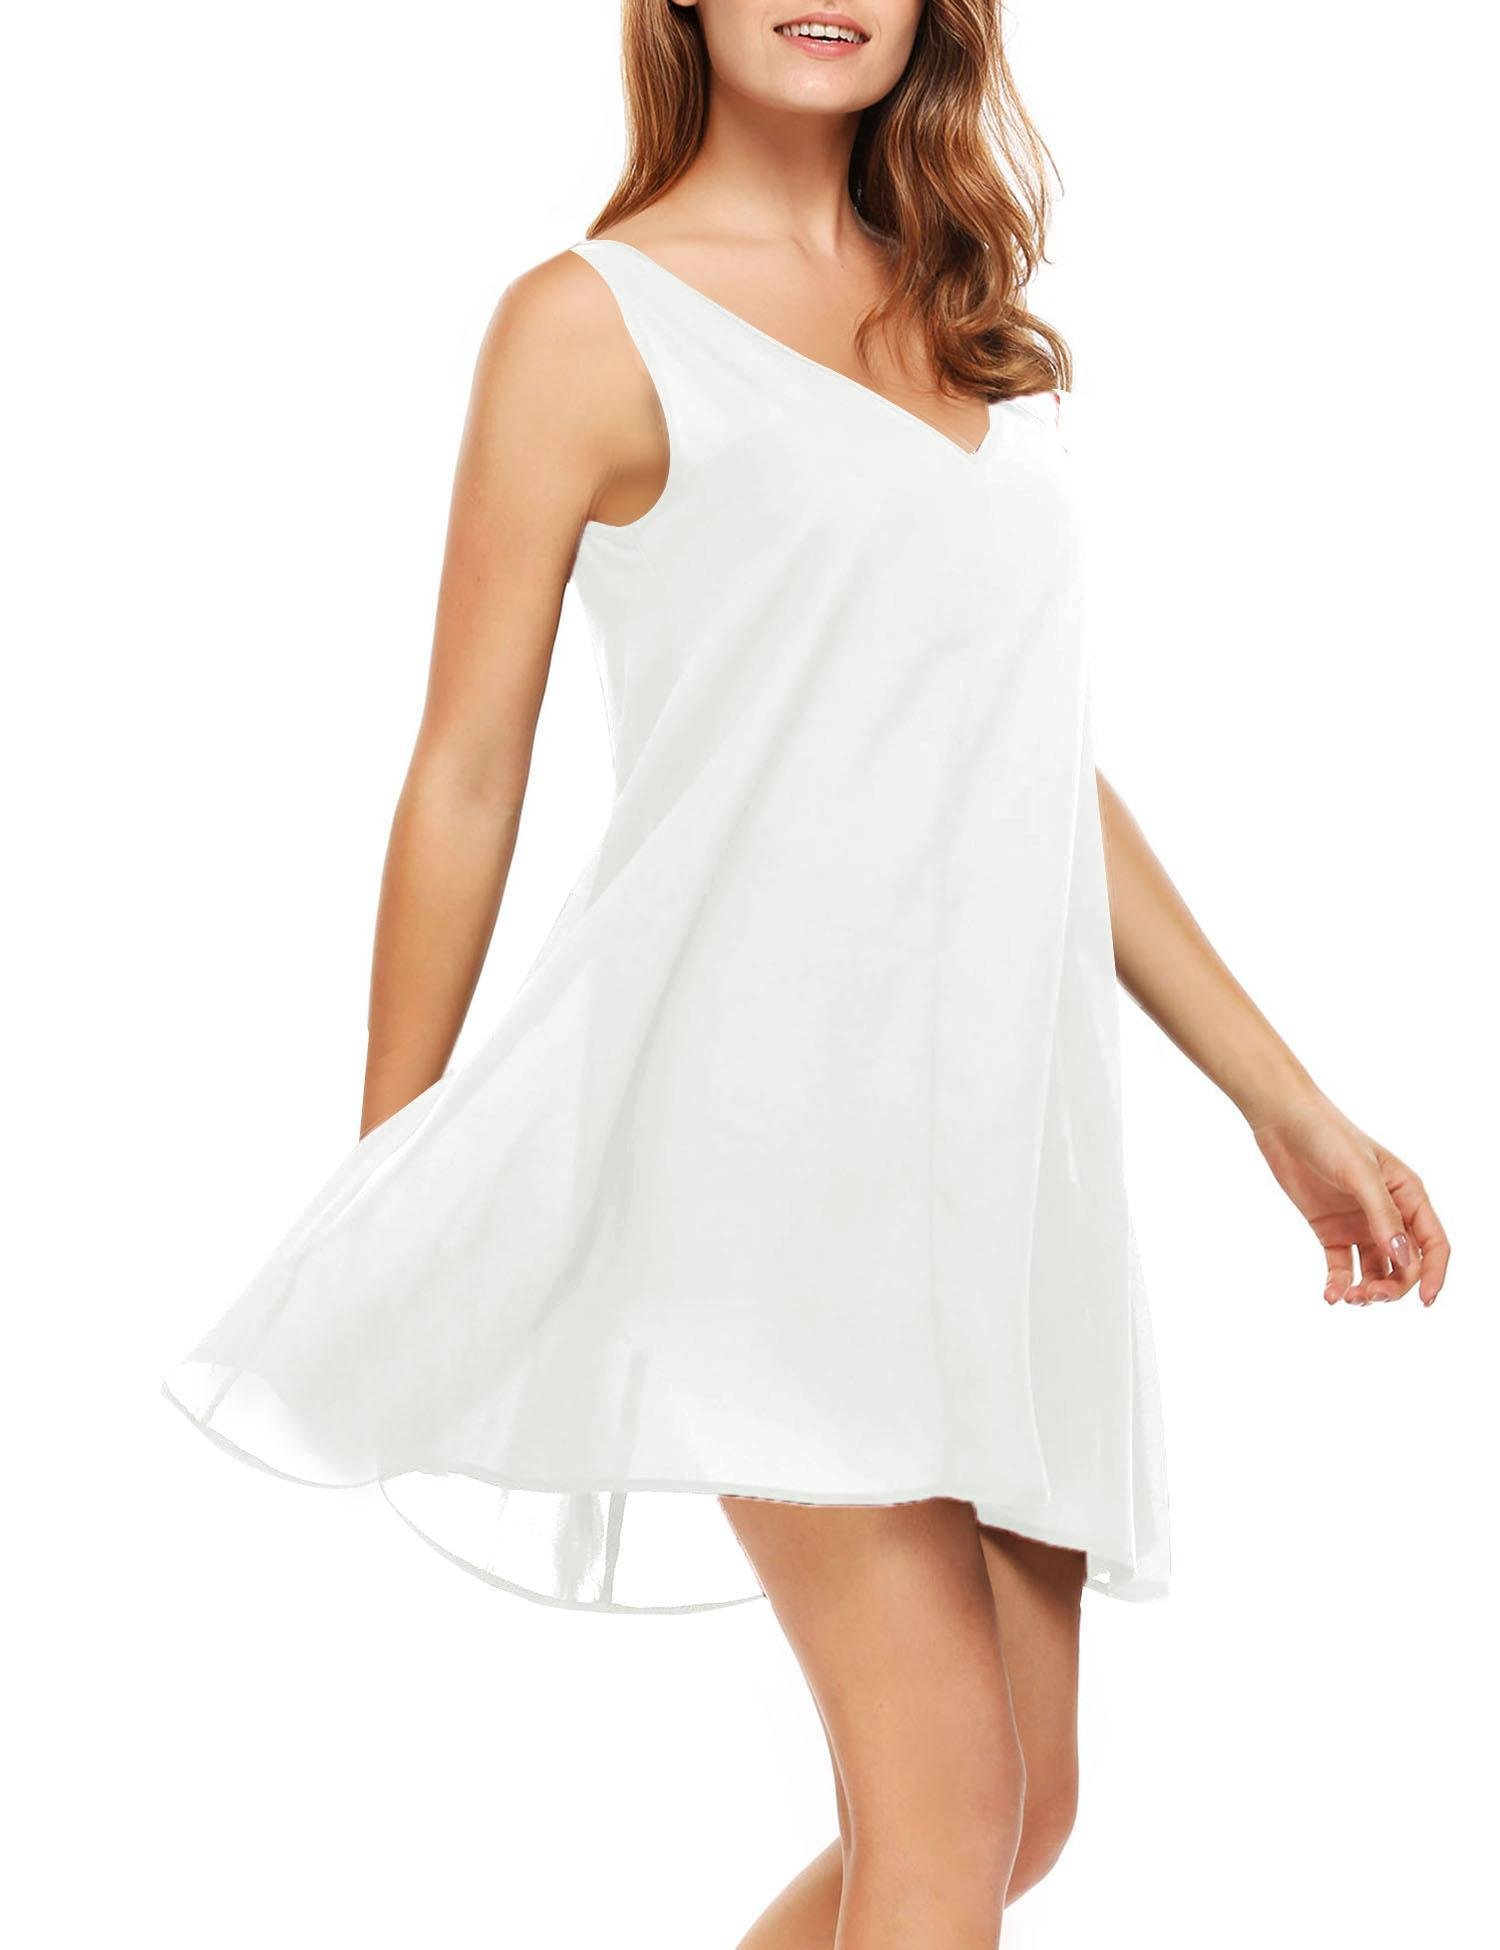 SE MIU Women V-Neck Sleeveless Loose Tank Summer Dress White L